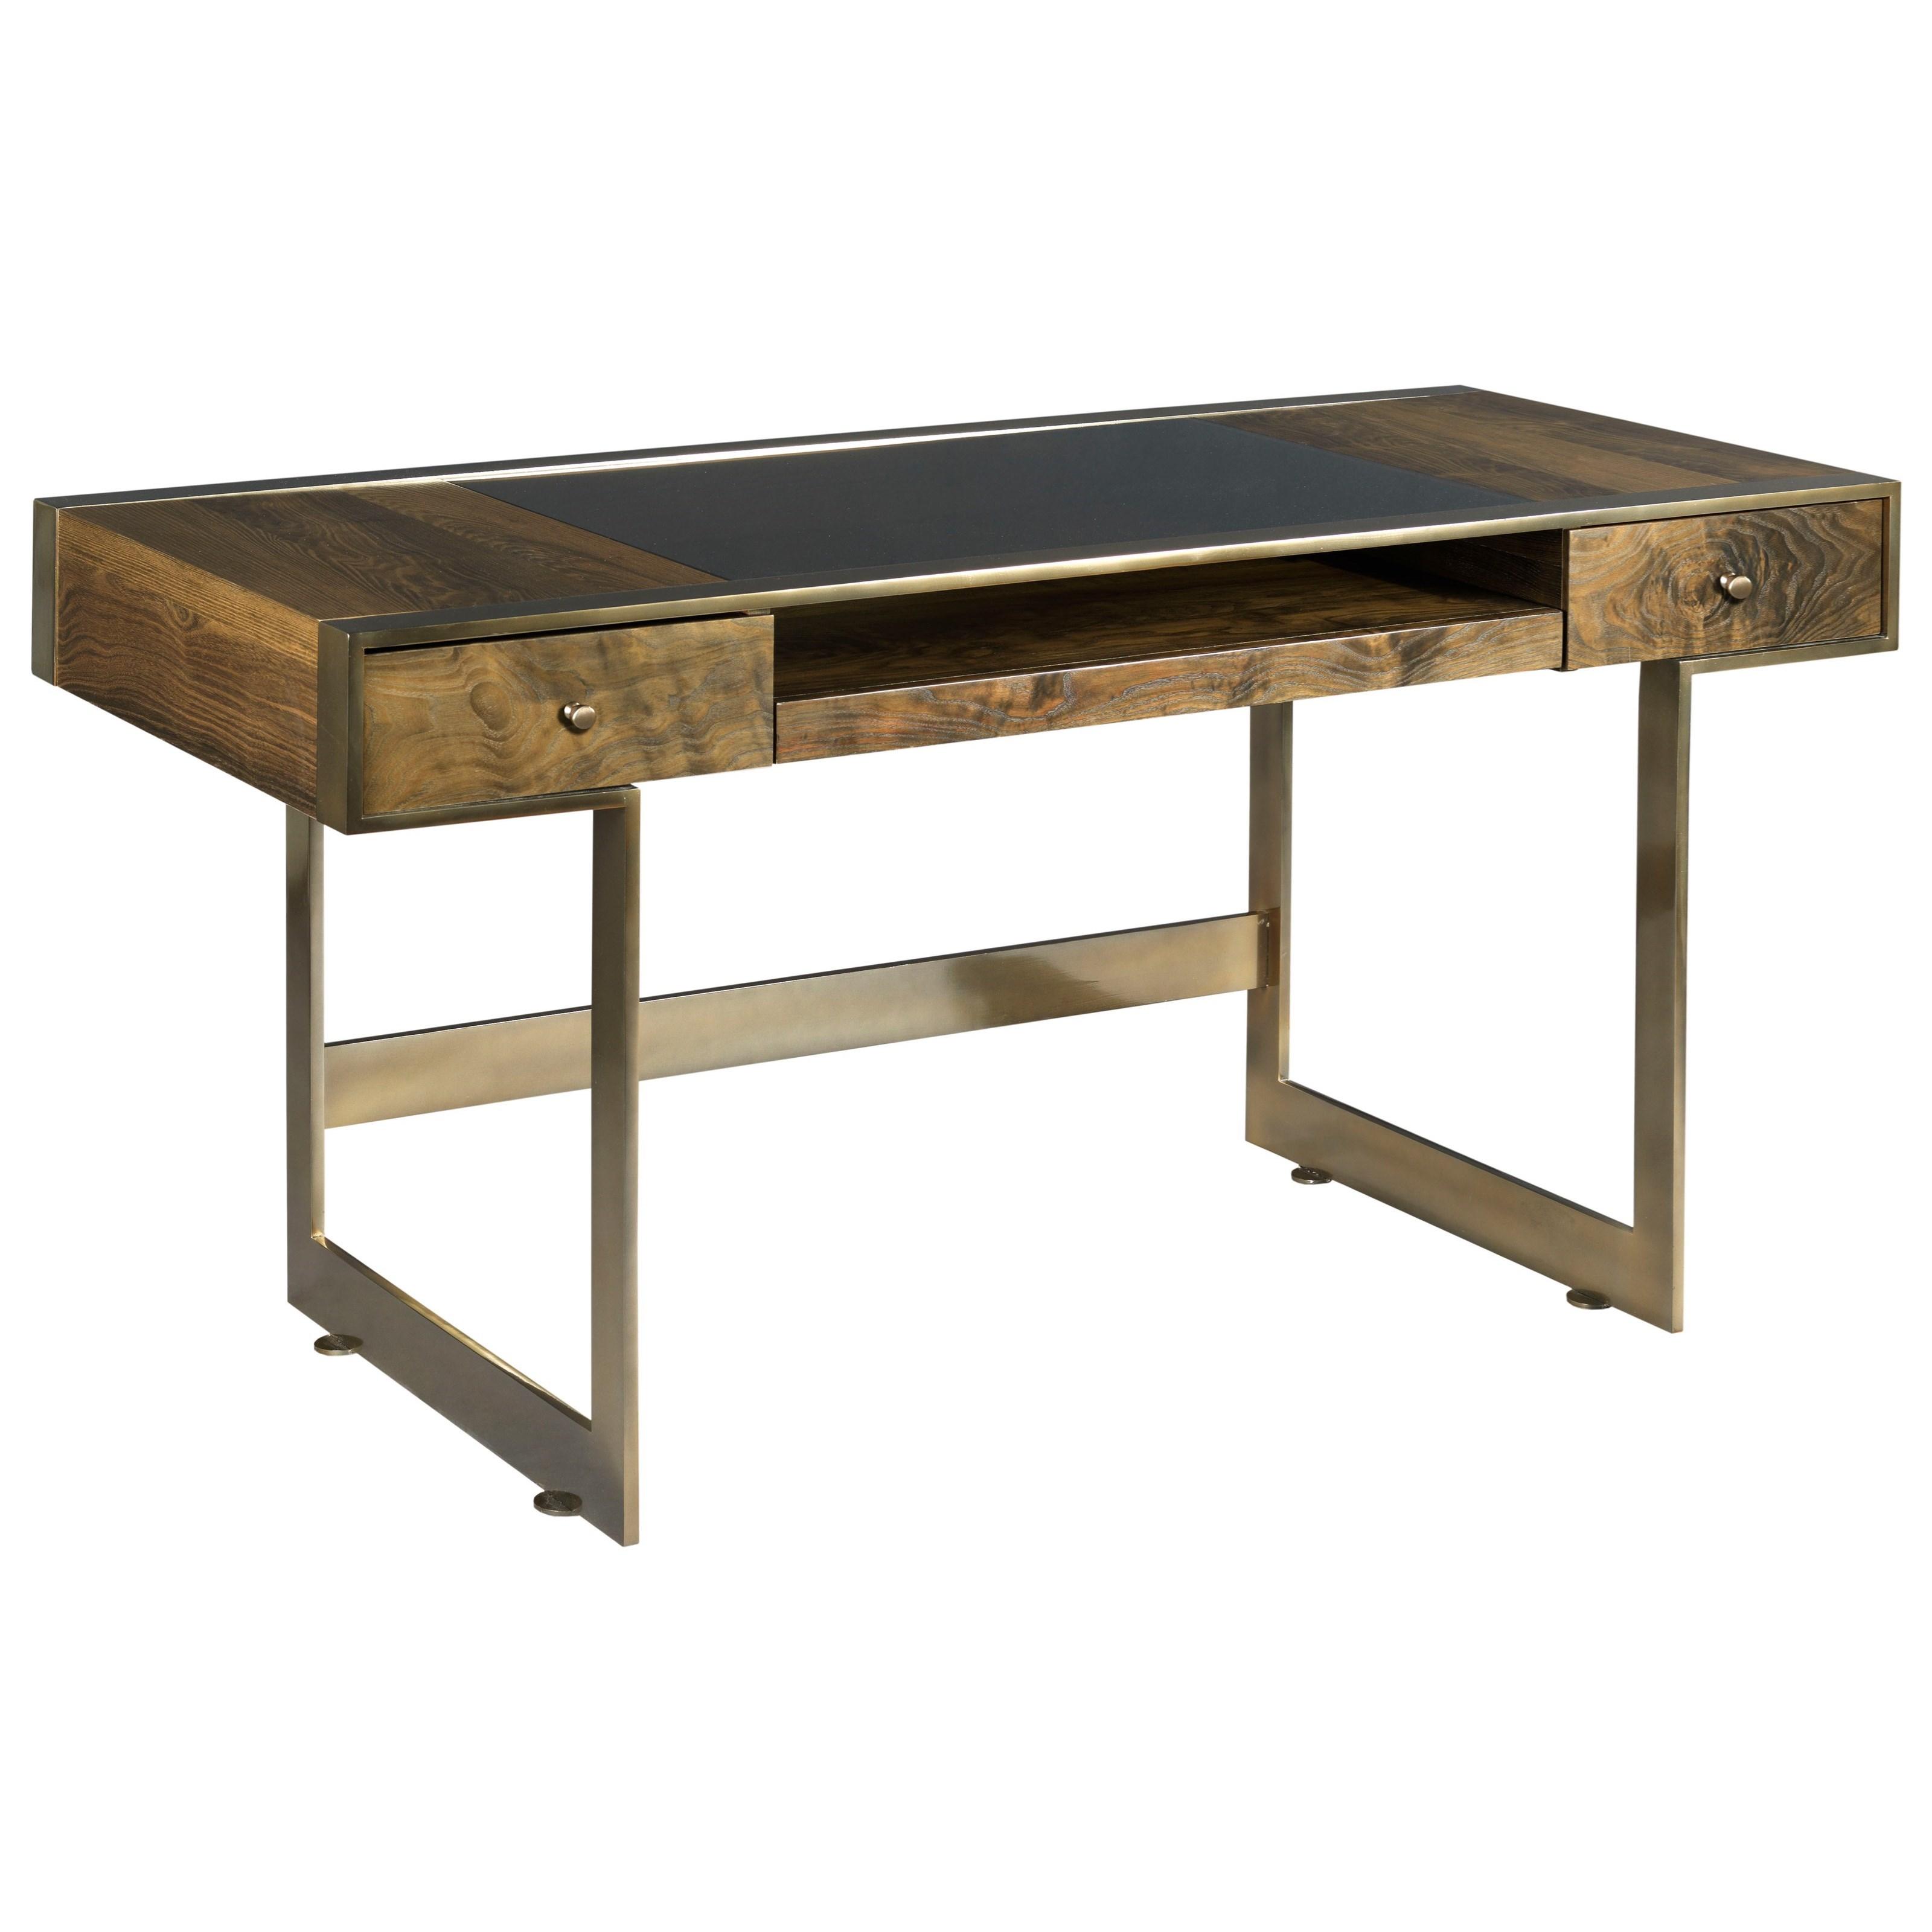 American Drew Ad Modern Organics Risden Desk - Item Number: 600-940